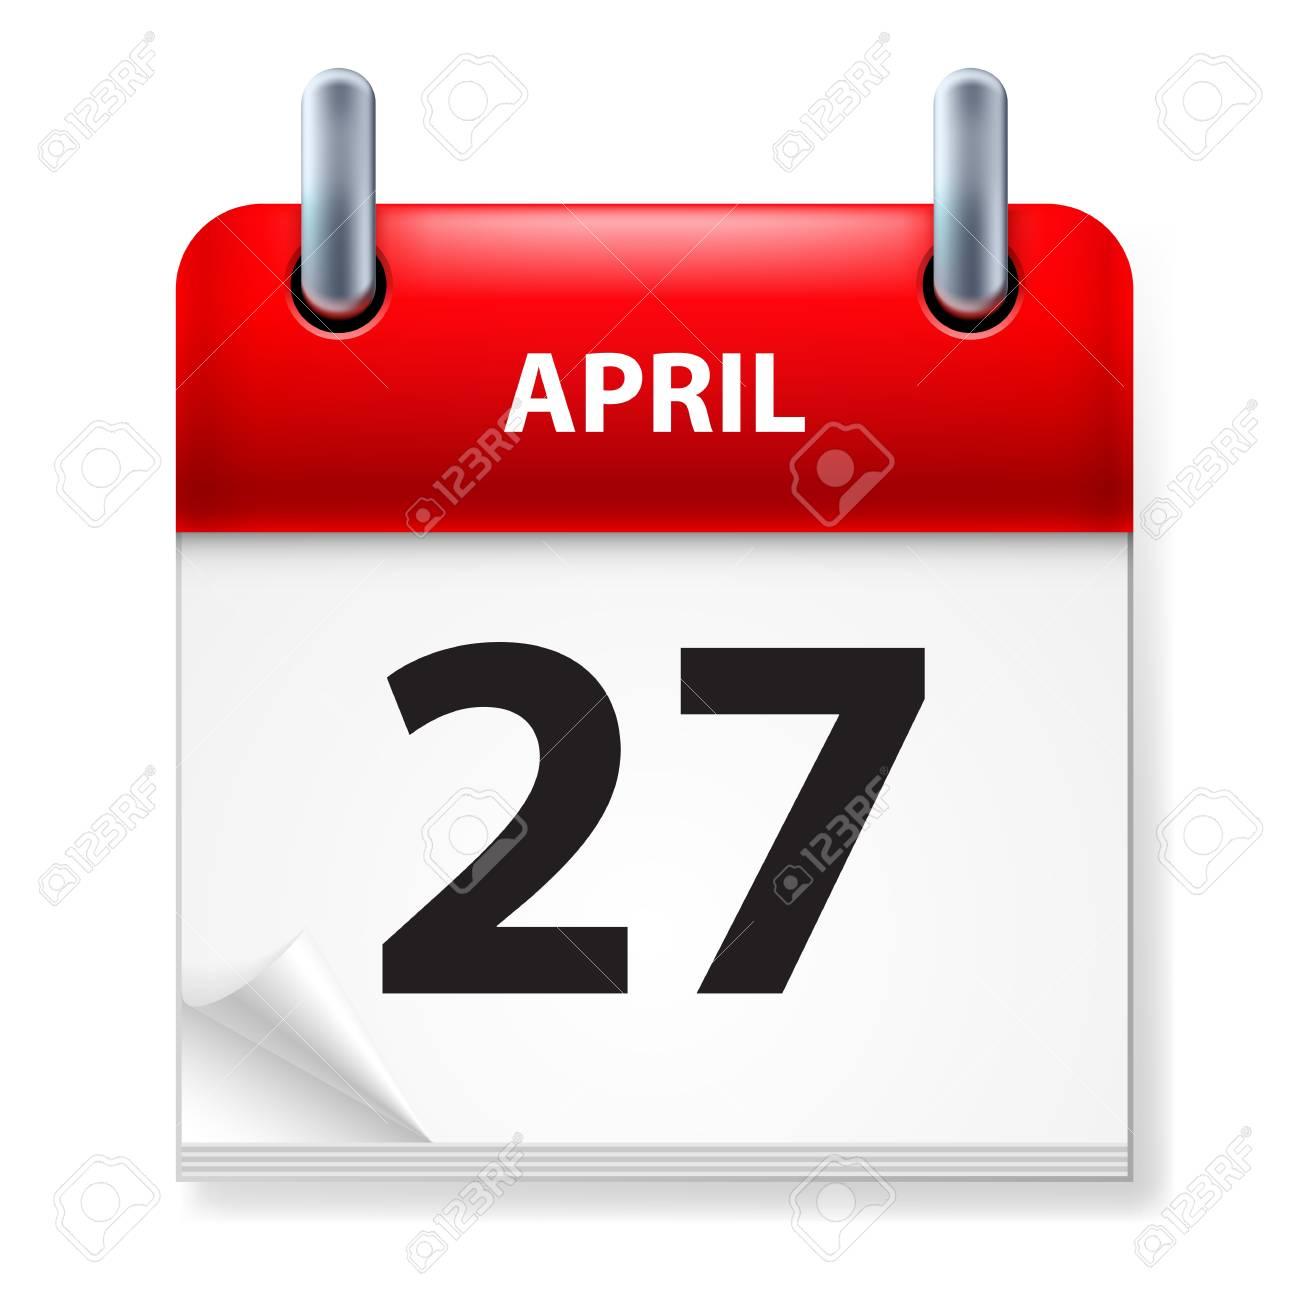 Twenty-seventh in April Calendar icon on white background Stock Vector - 14495496